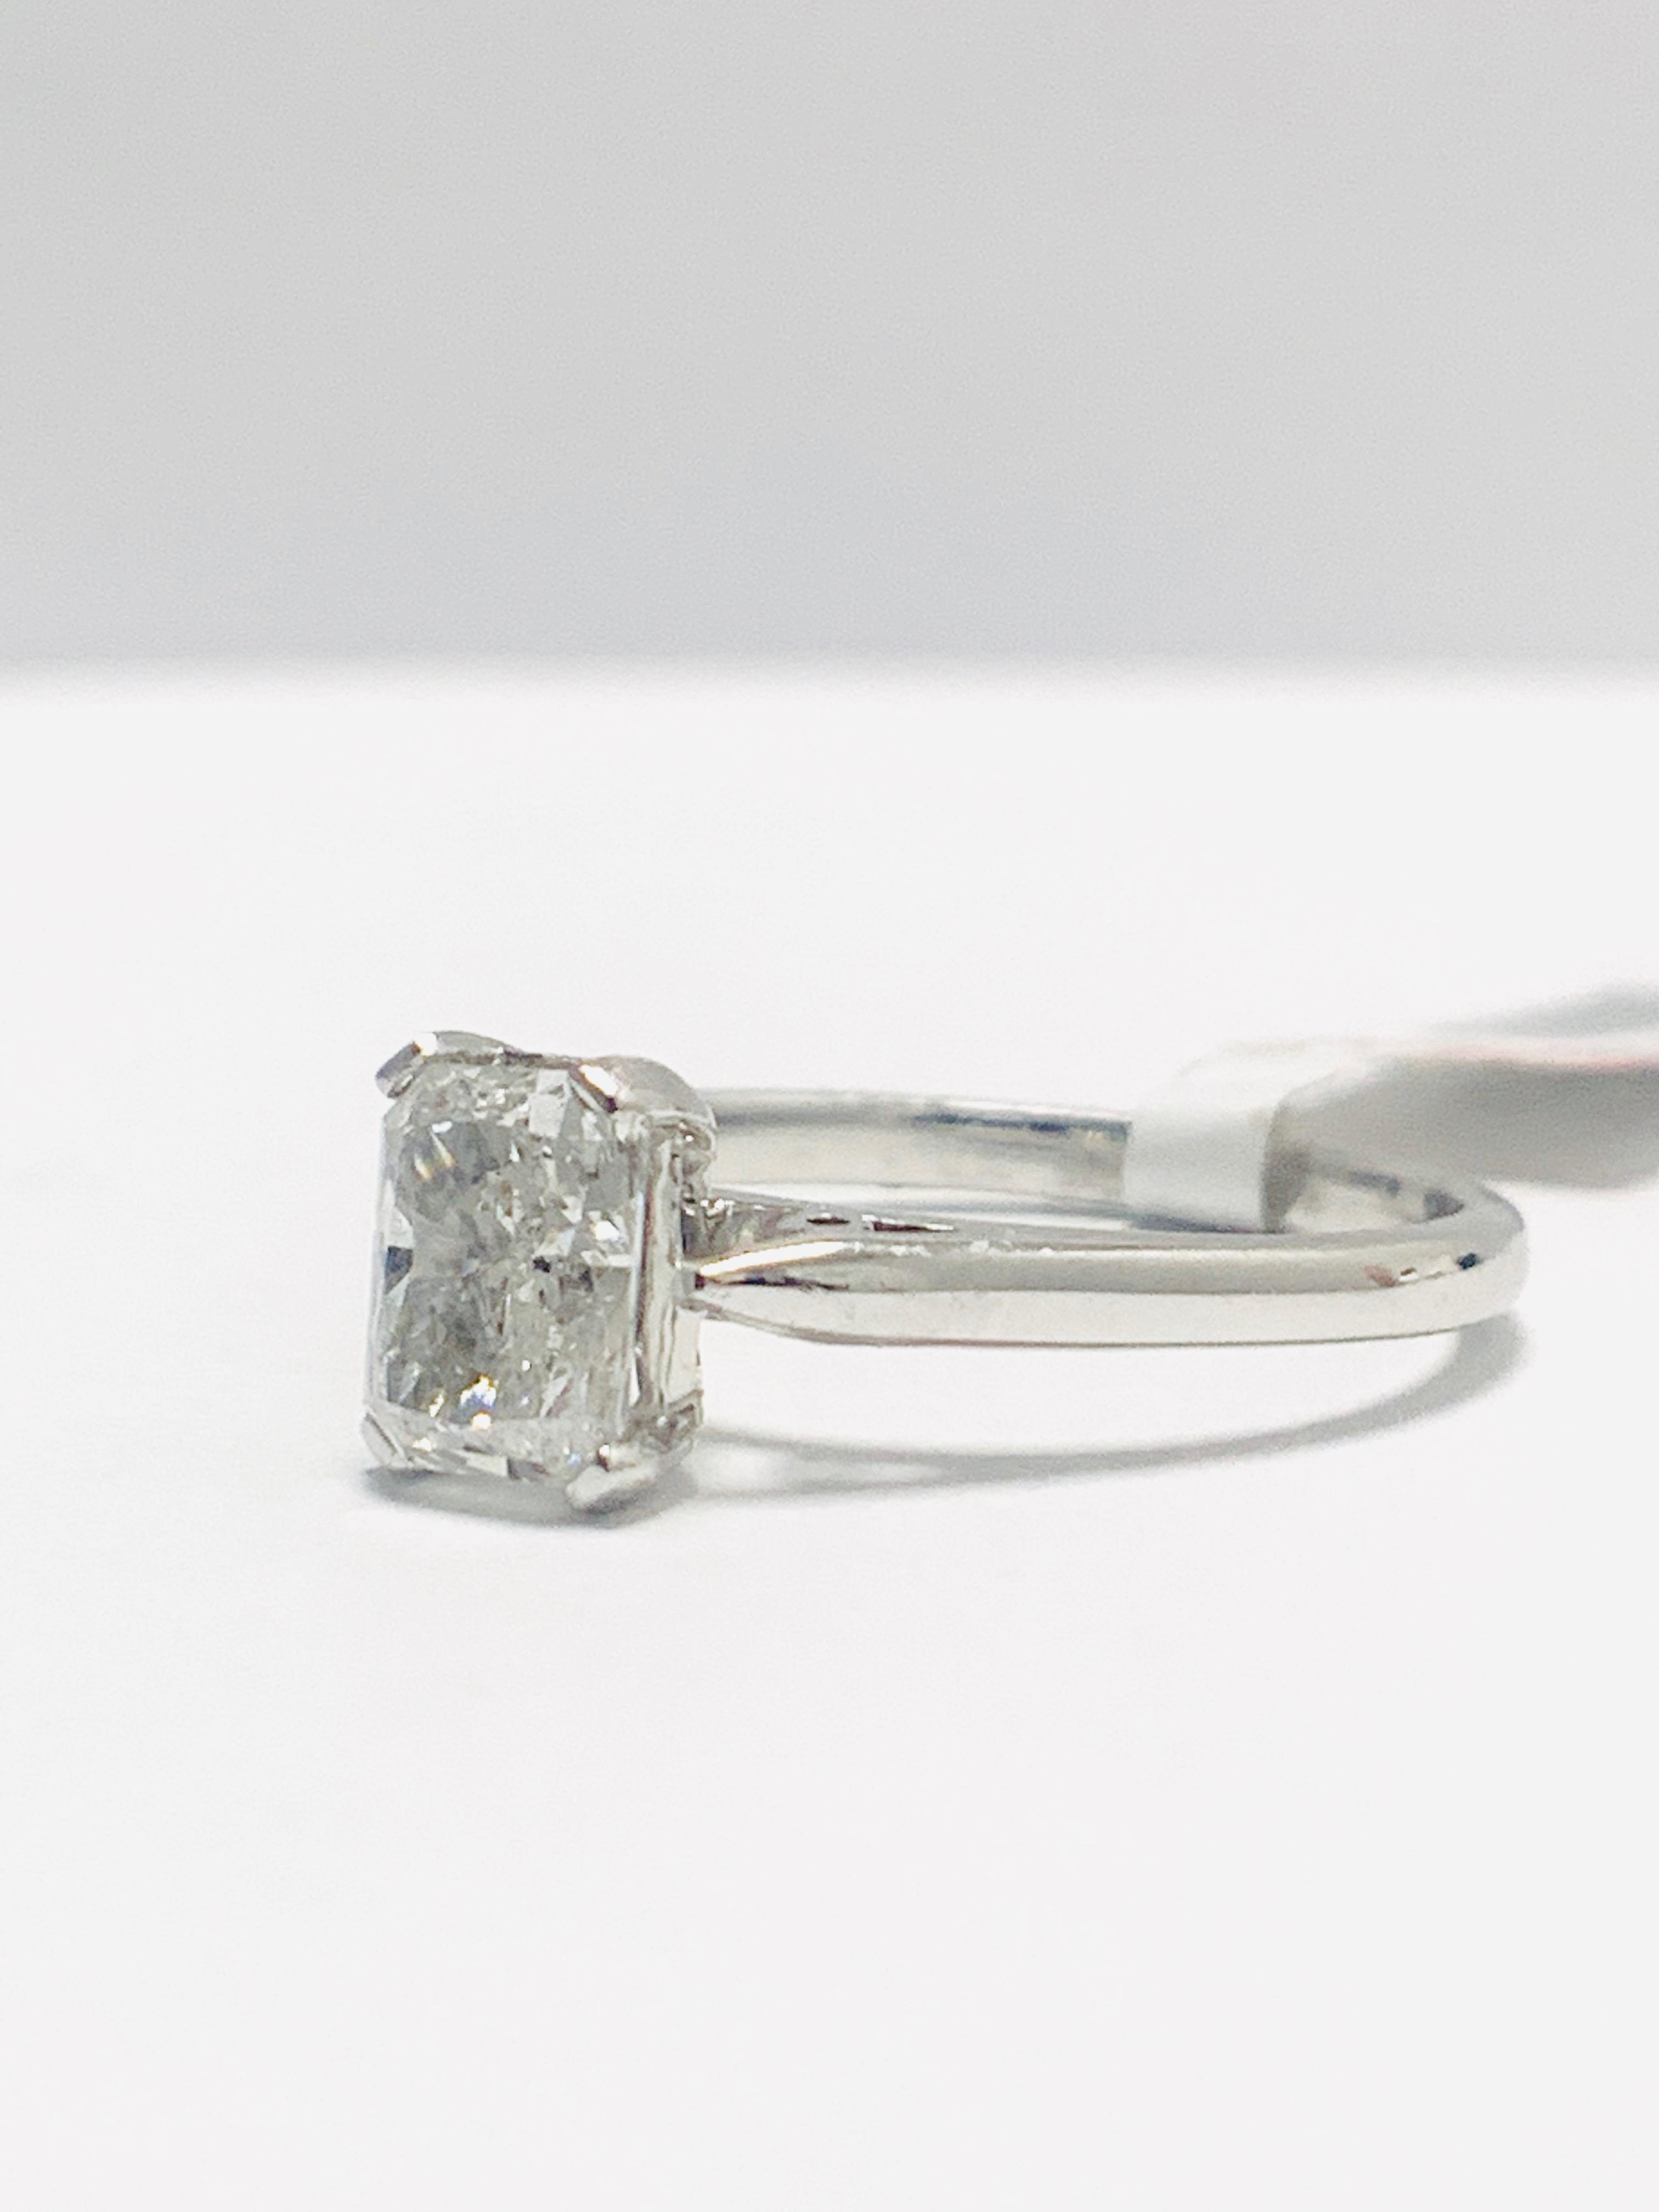 Lot 7 - 1ct Radiant cut natural diamond